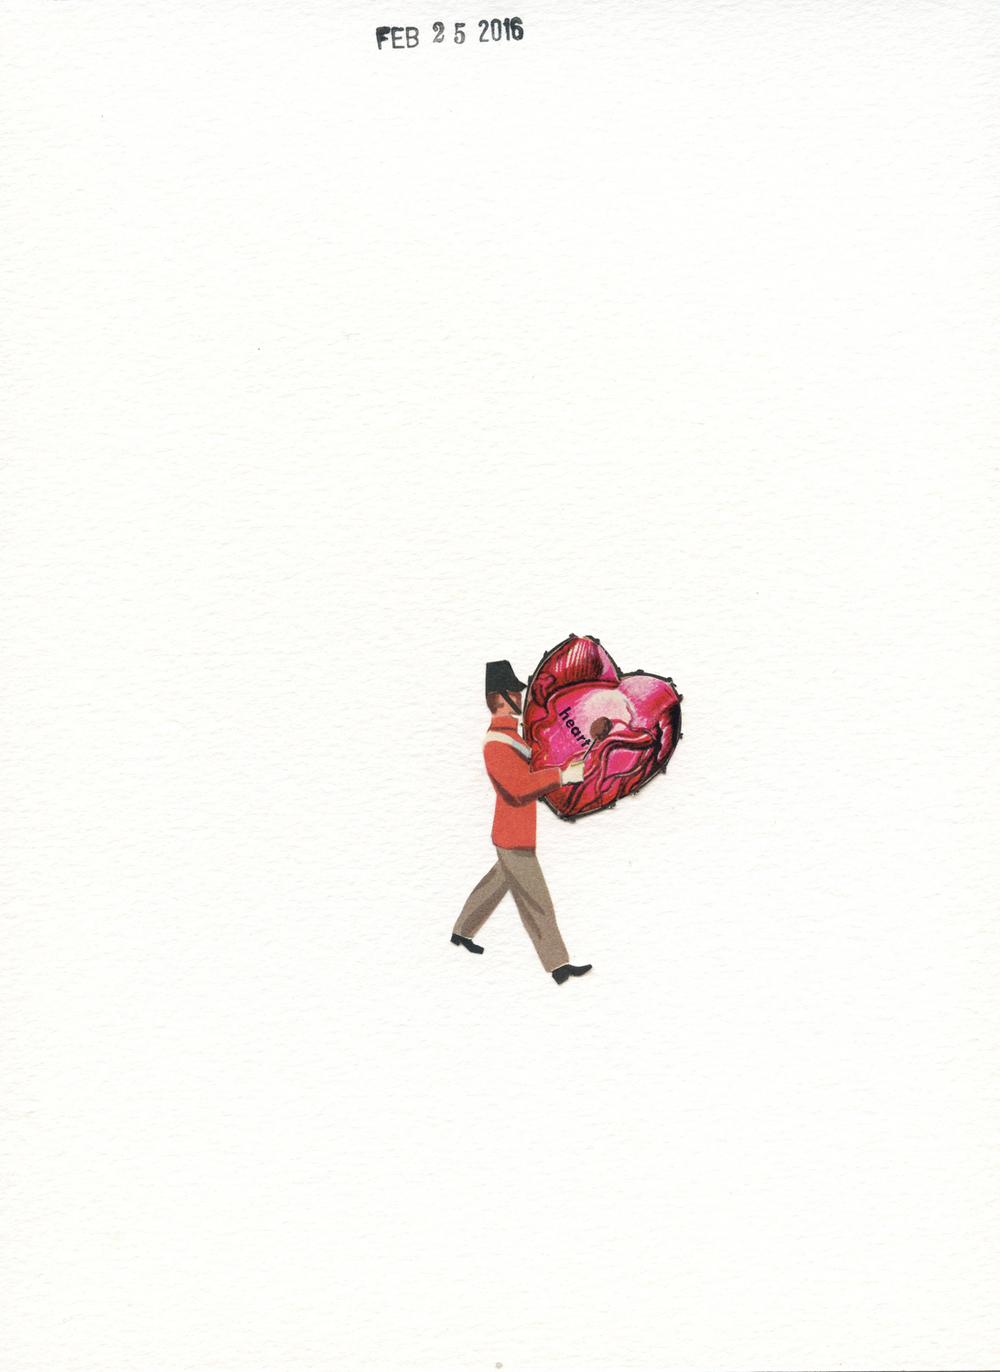 Heartbeats (144)